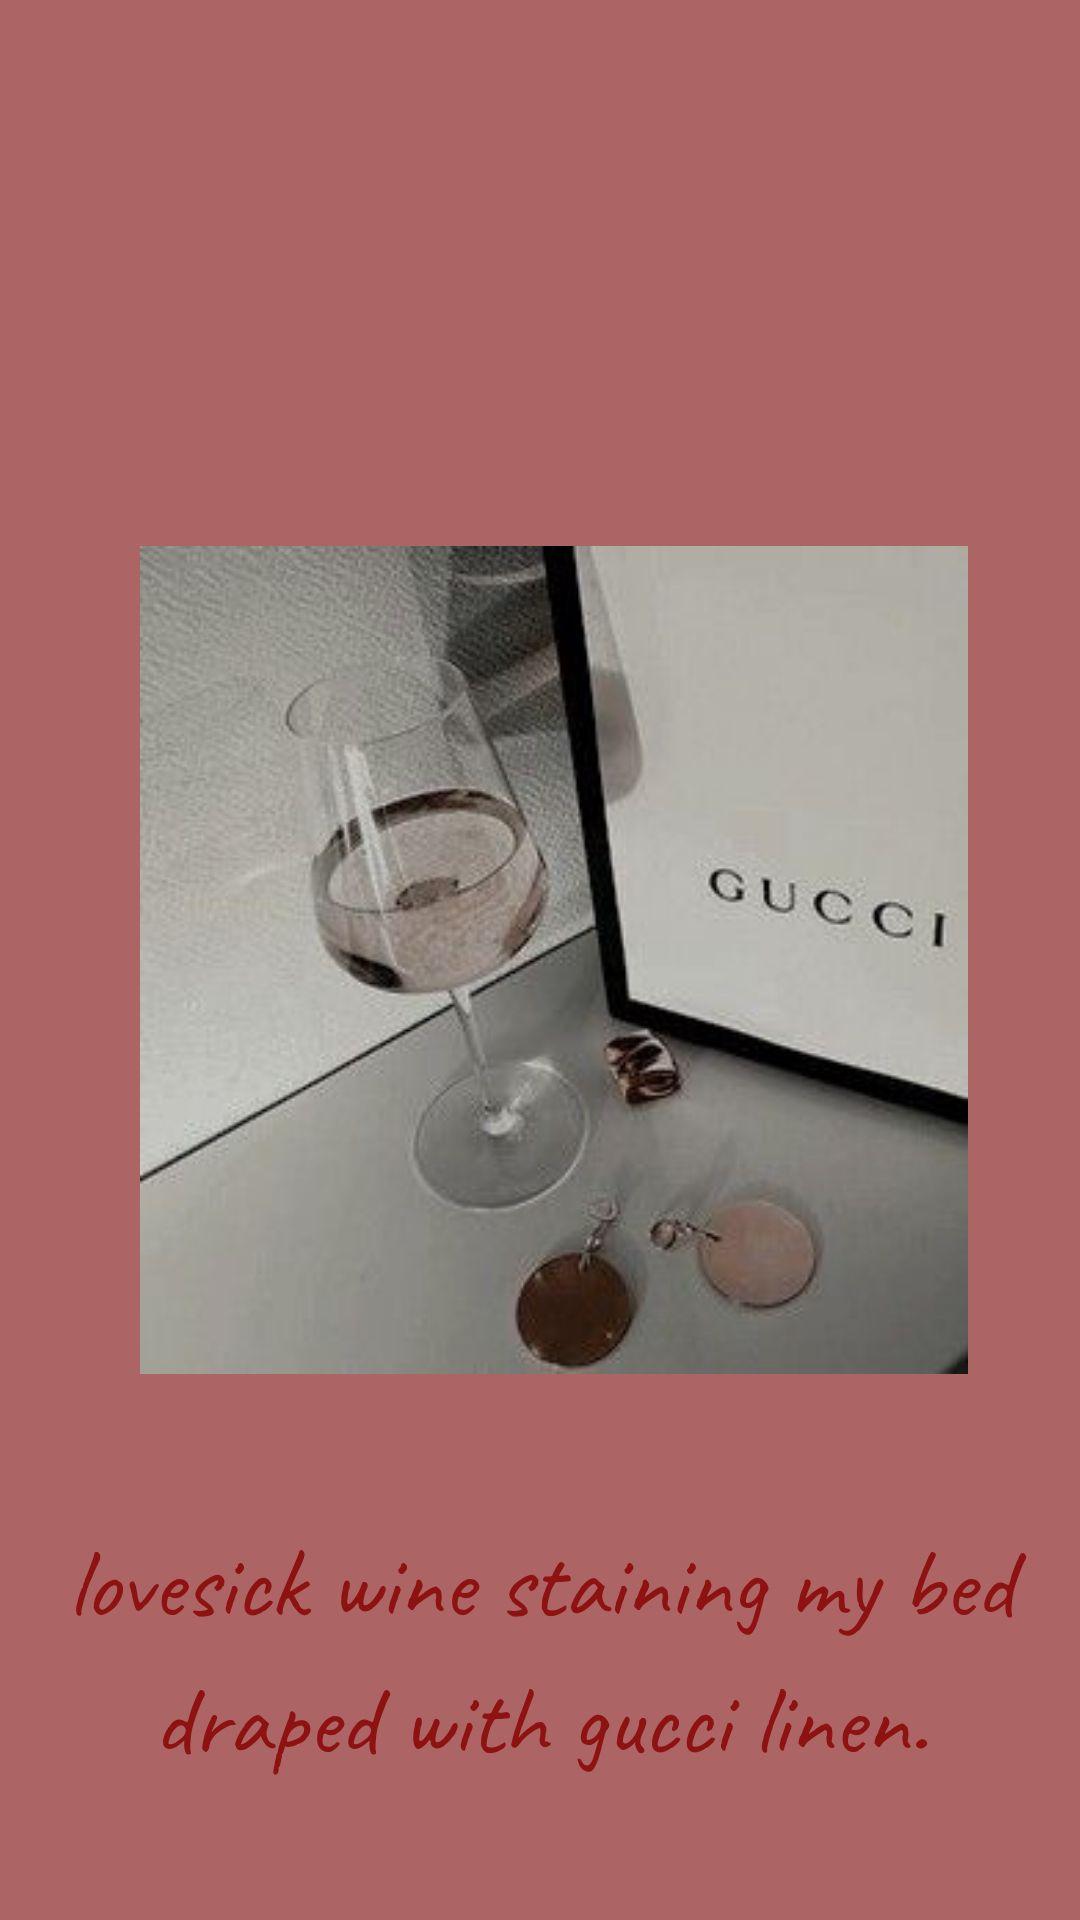 Gucci Pink Wine Aesthetic Blackbear Canva Wallpaper Lockscreen Iphone Wallpaper Iphone Cute Iphone Wallpaper Fall Wine Stains